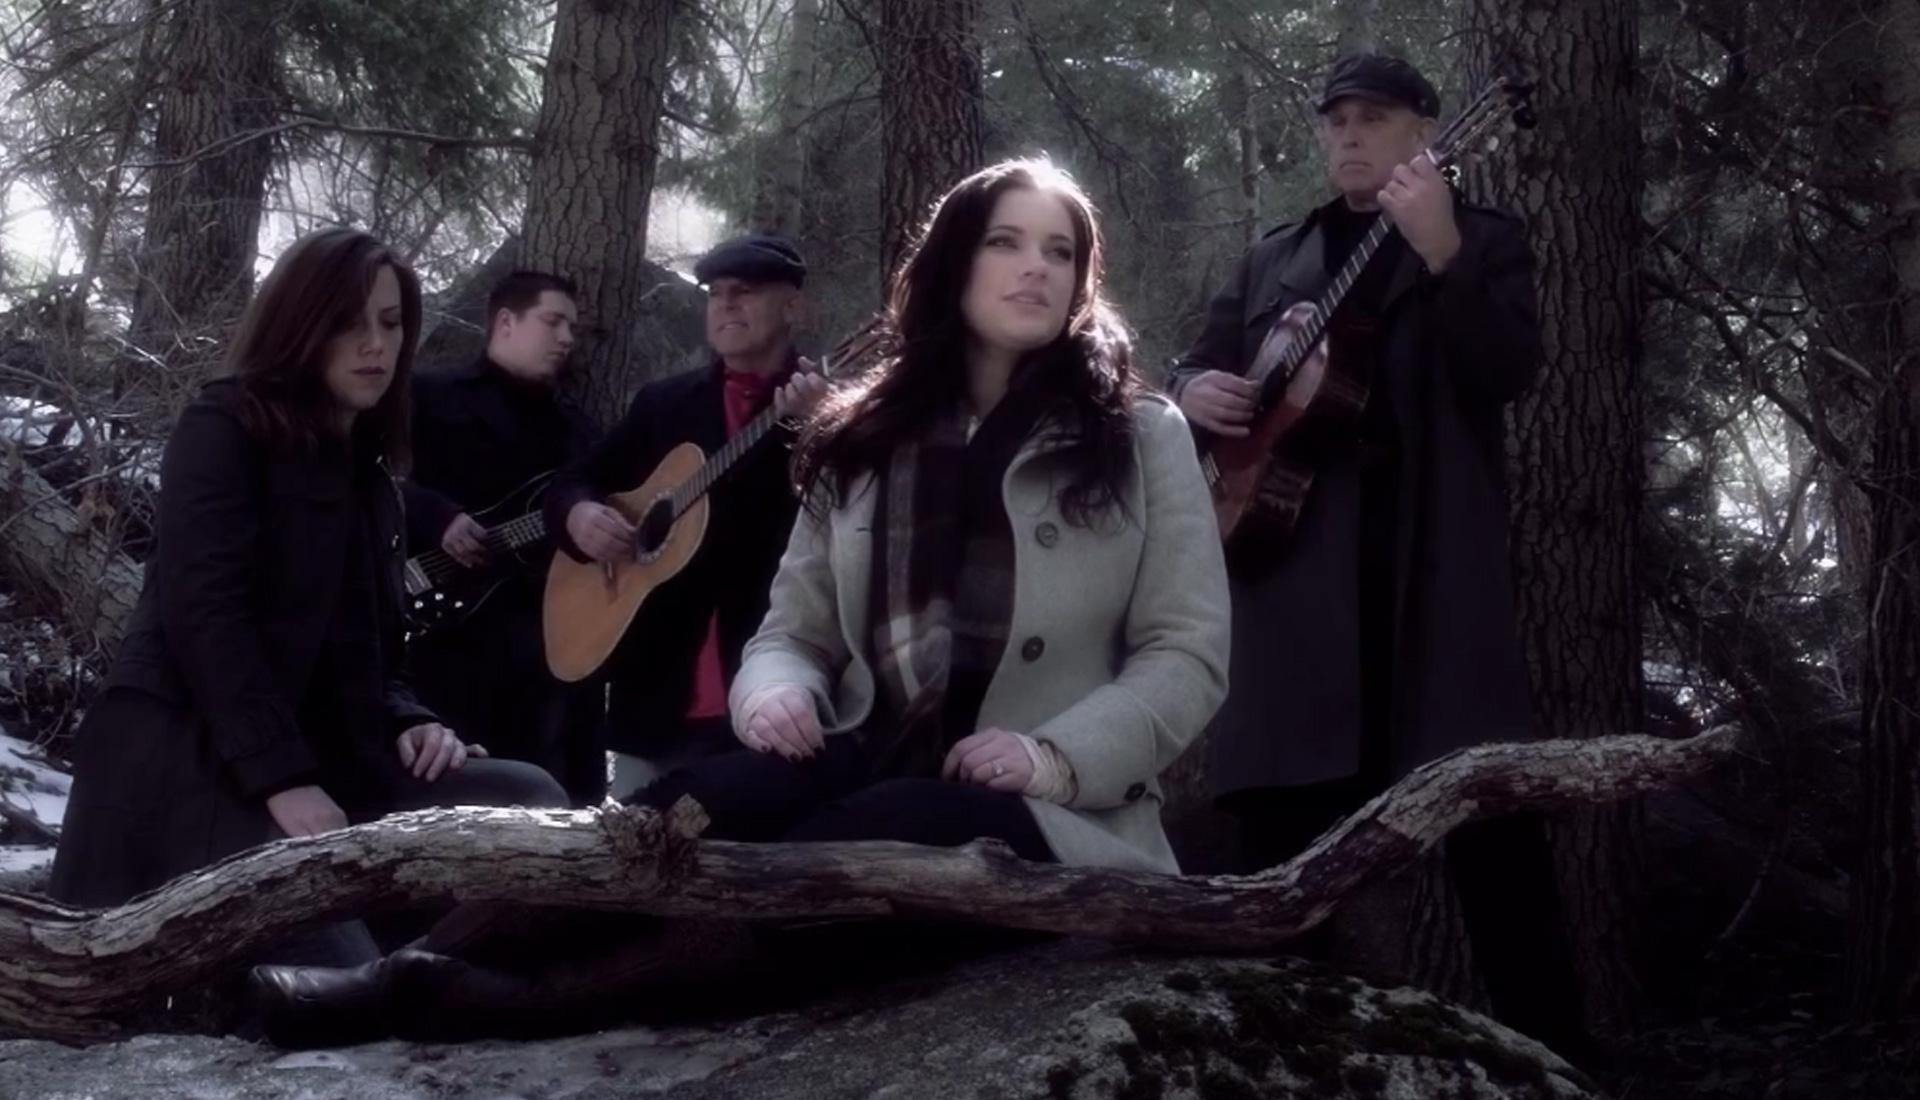 Salt Lake City Musicians